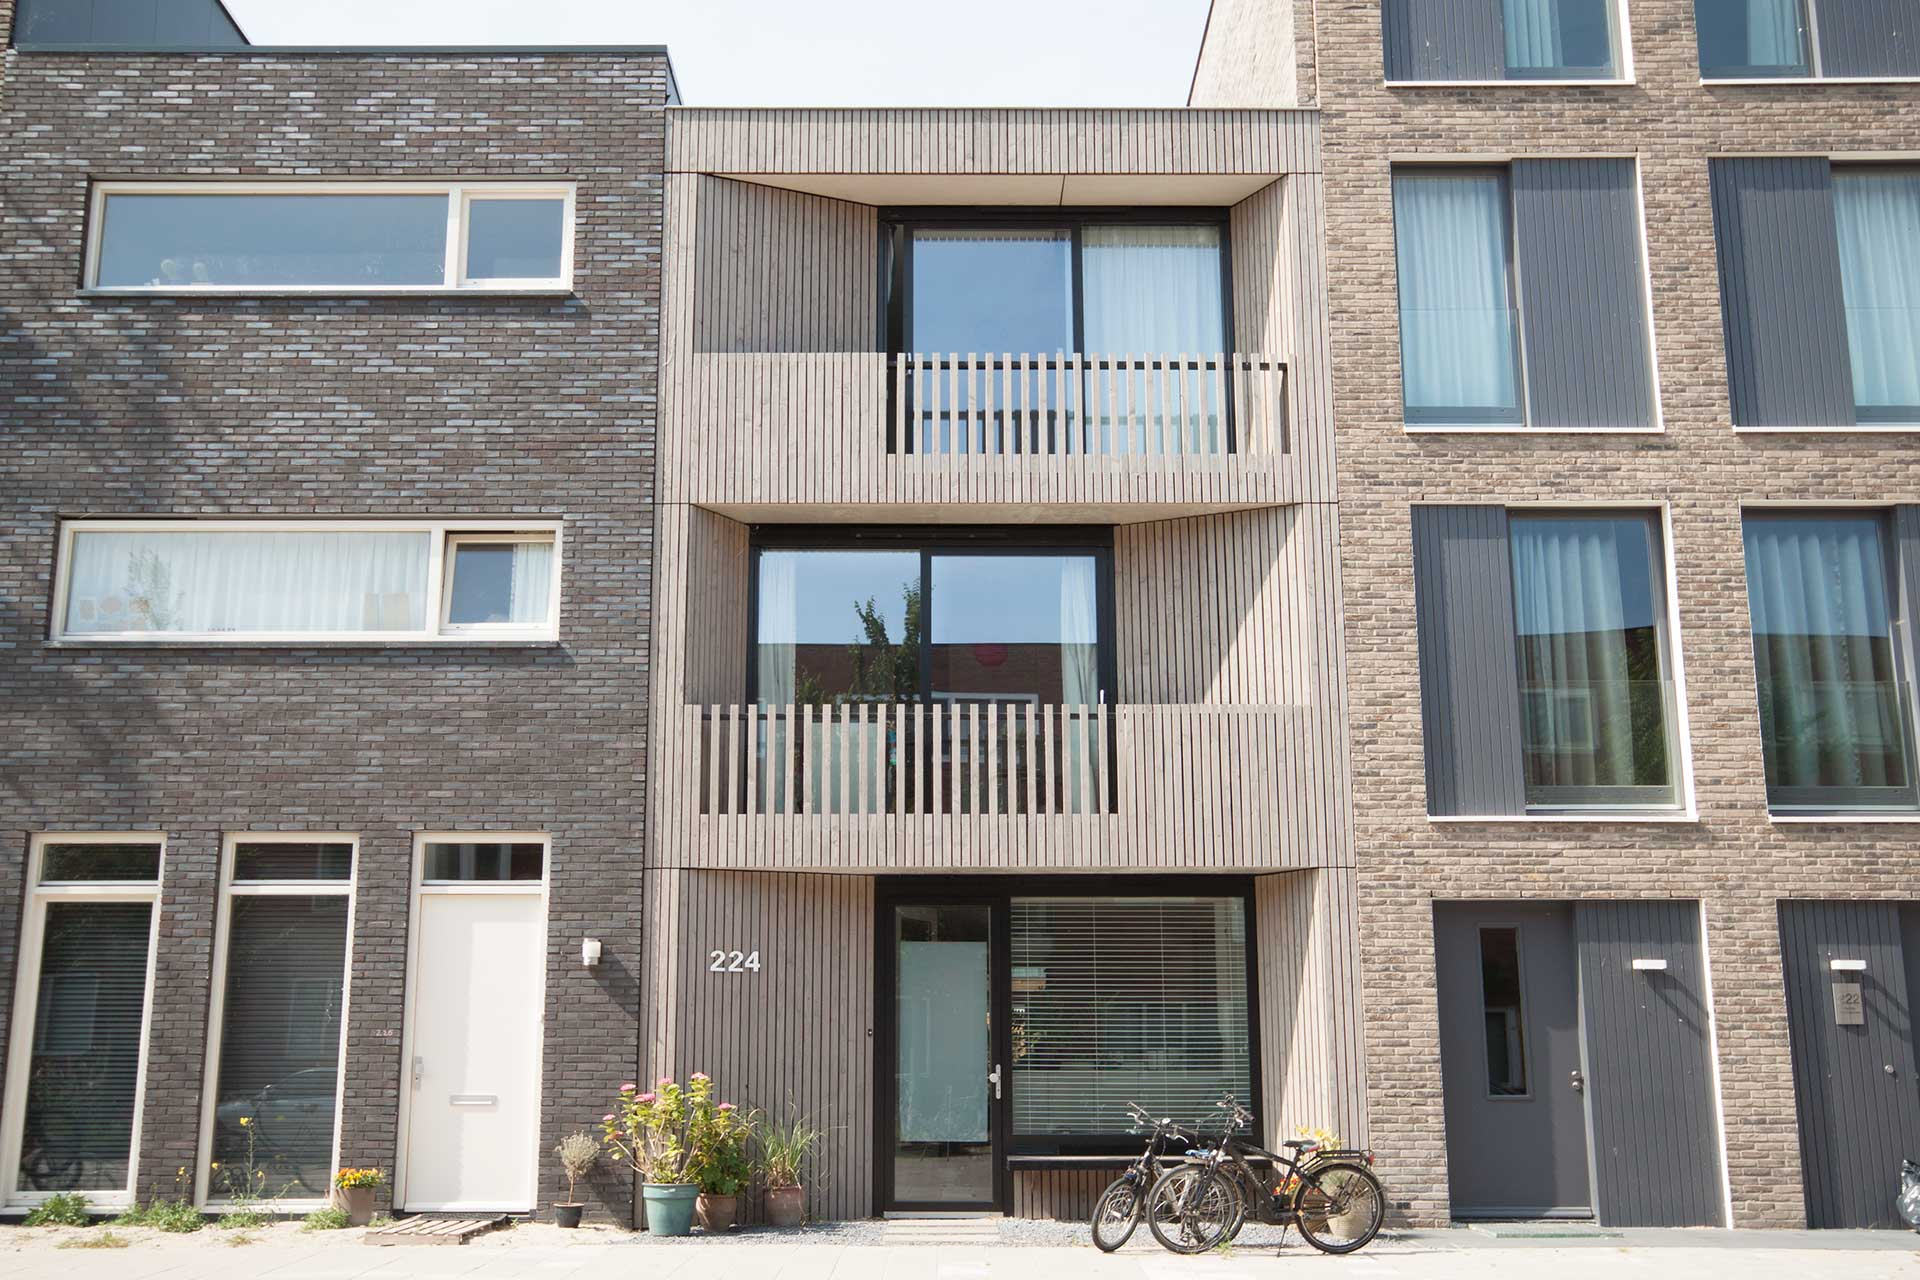 8A-Architecten-loggia-house-amsterdam-ijburg-02